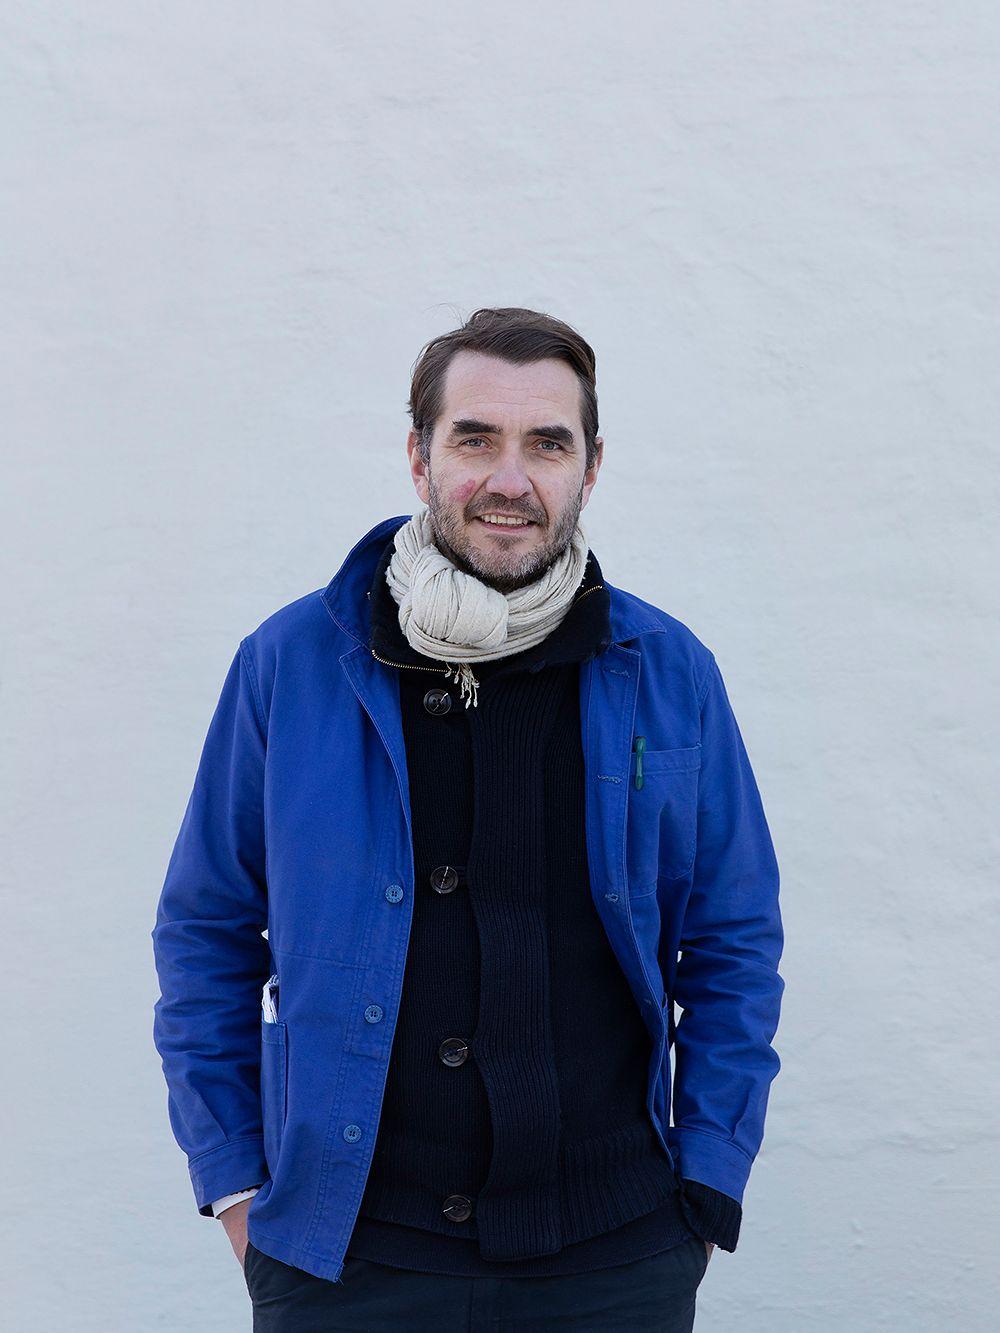 Espen Surnevik